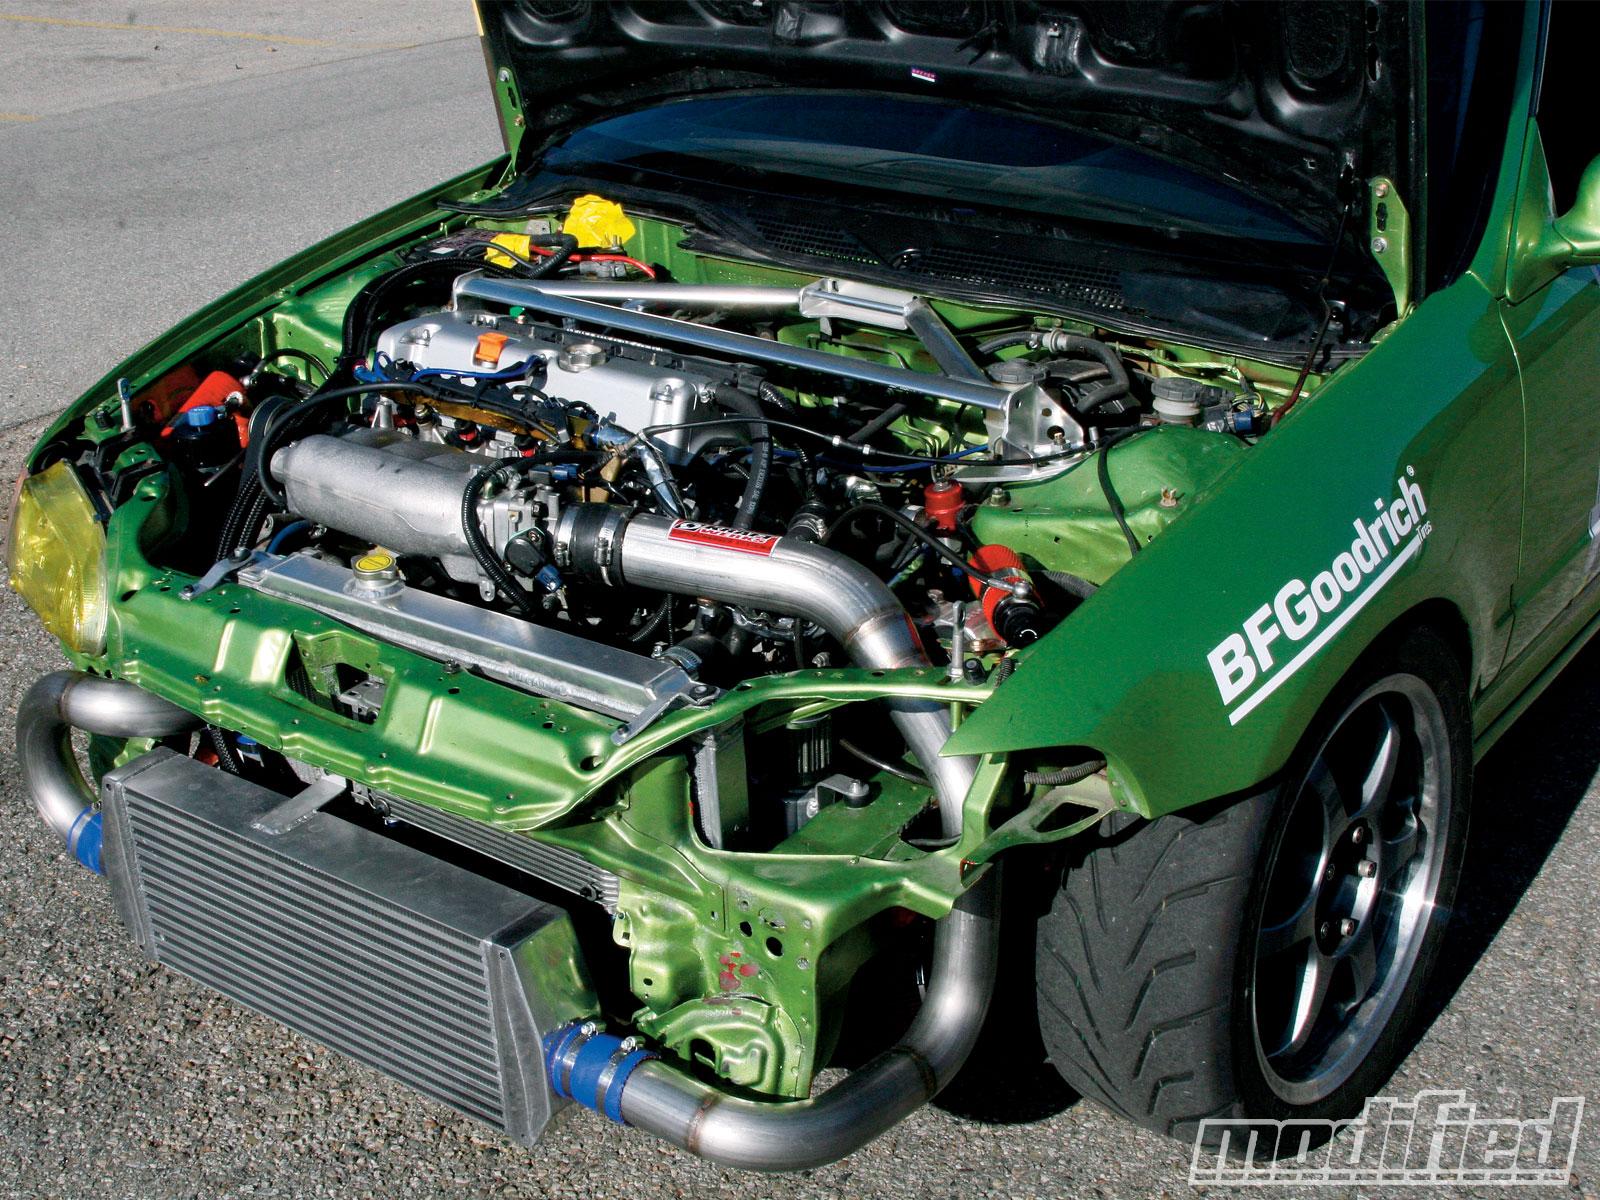 1993 Honda Civic CX Hatchback - Kraftwerks K-series Race